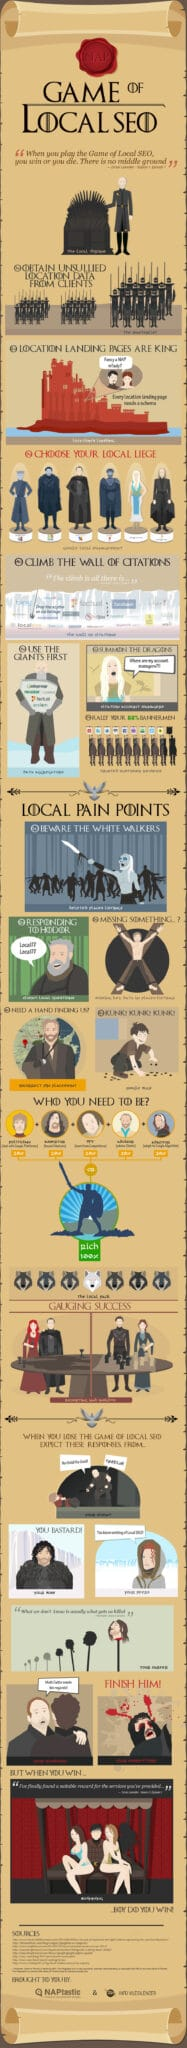 Infographie : le référencement local façon Game of Thrones